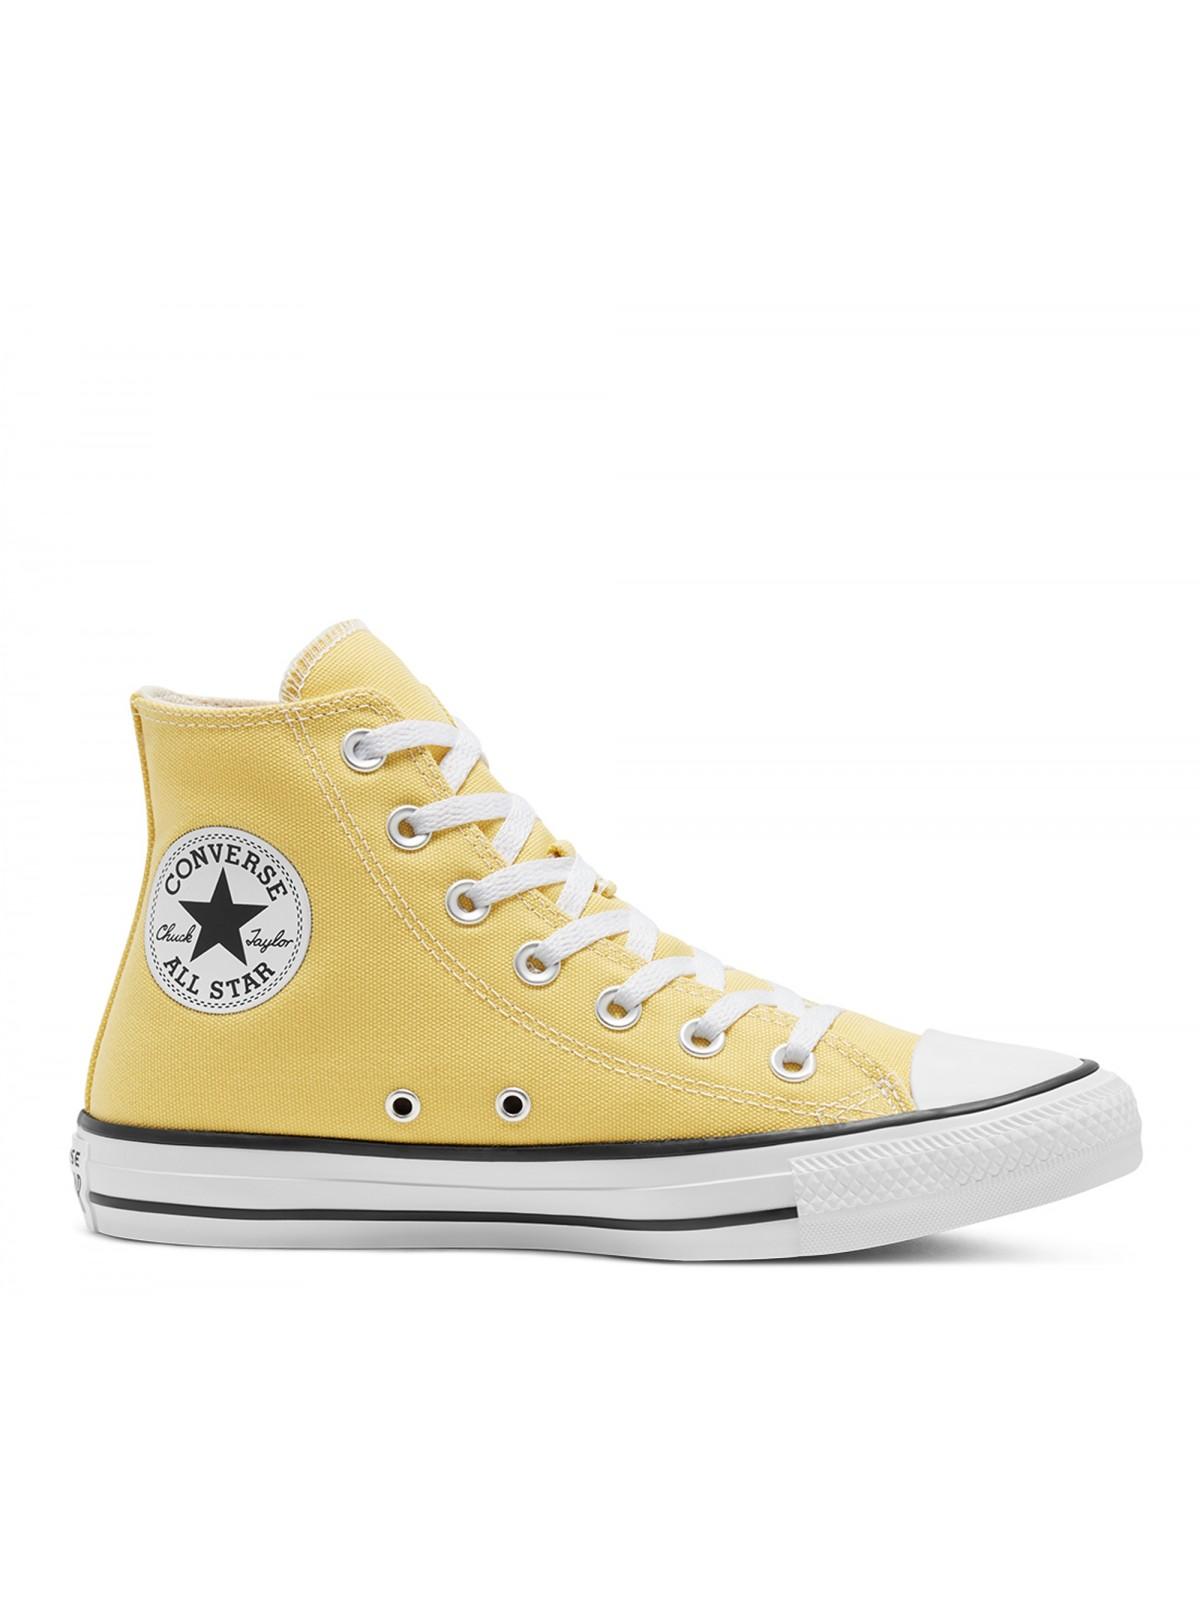 Converse Chuck Taylor all star Butter yellow